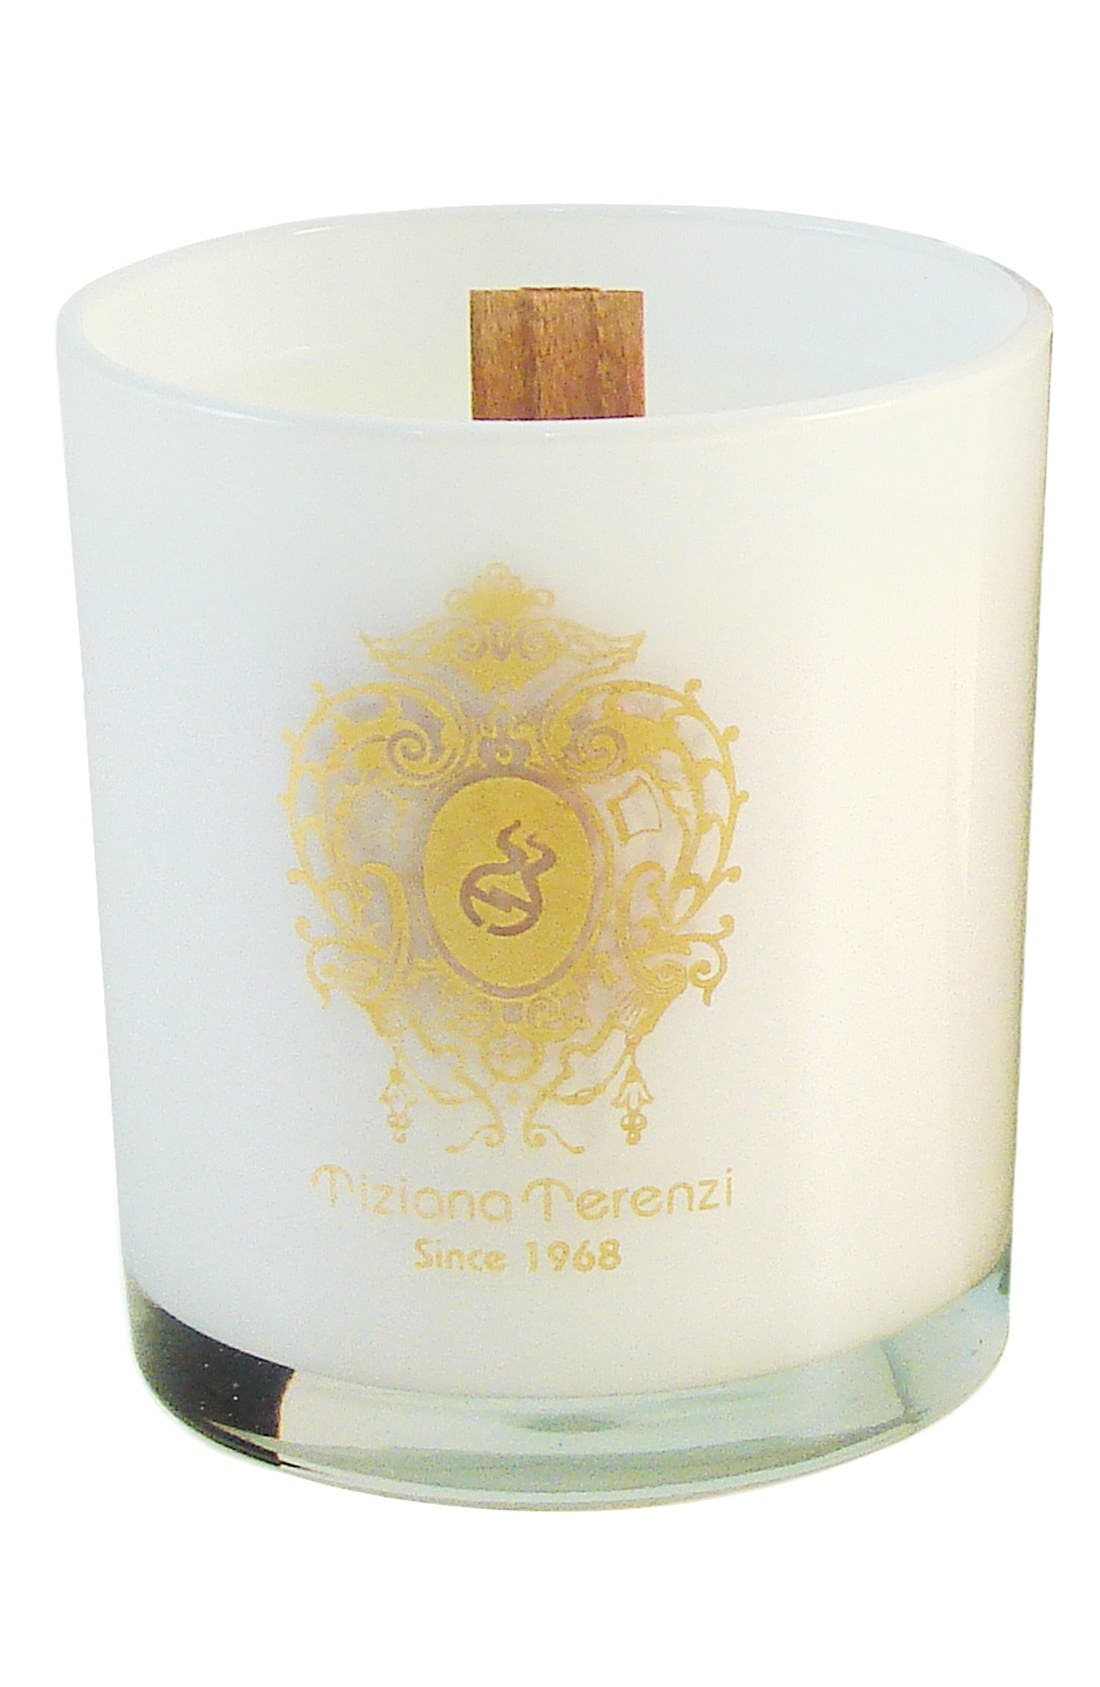 'Arethusa' Single Wick Gioconda Candle,                             Main thumbnail 1, color,                             NO COLOR